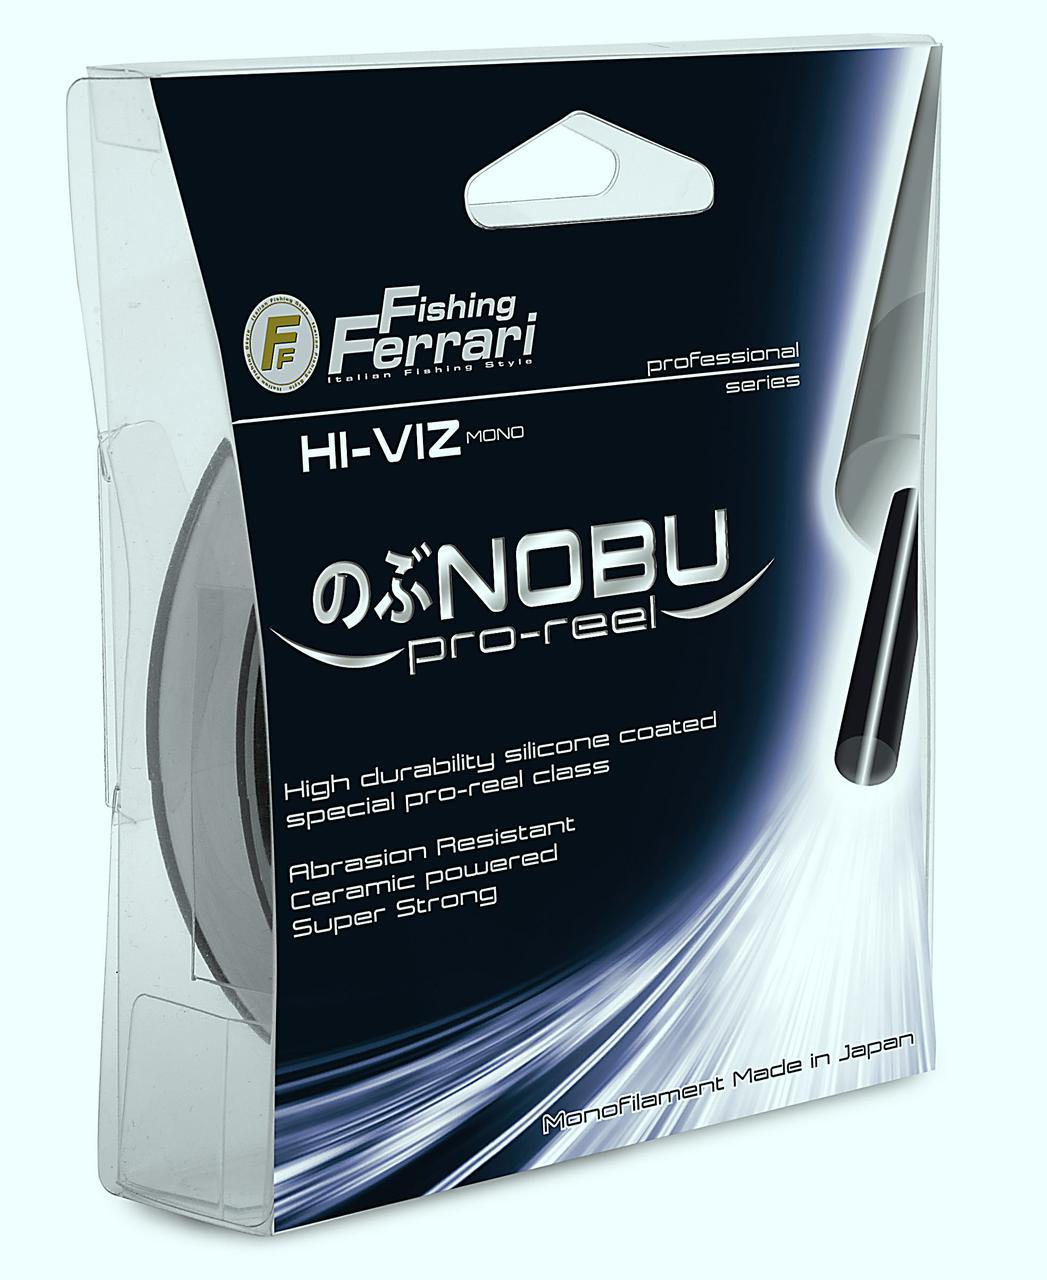 Леска Lineaeffe FF NOBU  Pro Reel 0.20мм 150м. FishTest-6,30кг Sand Special (серый)  Made in Japan